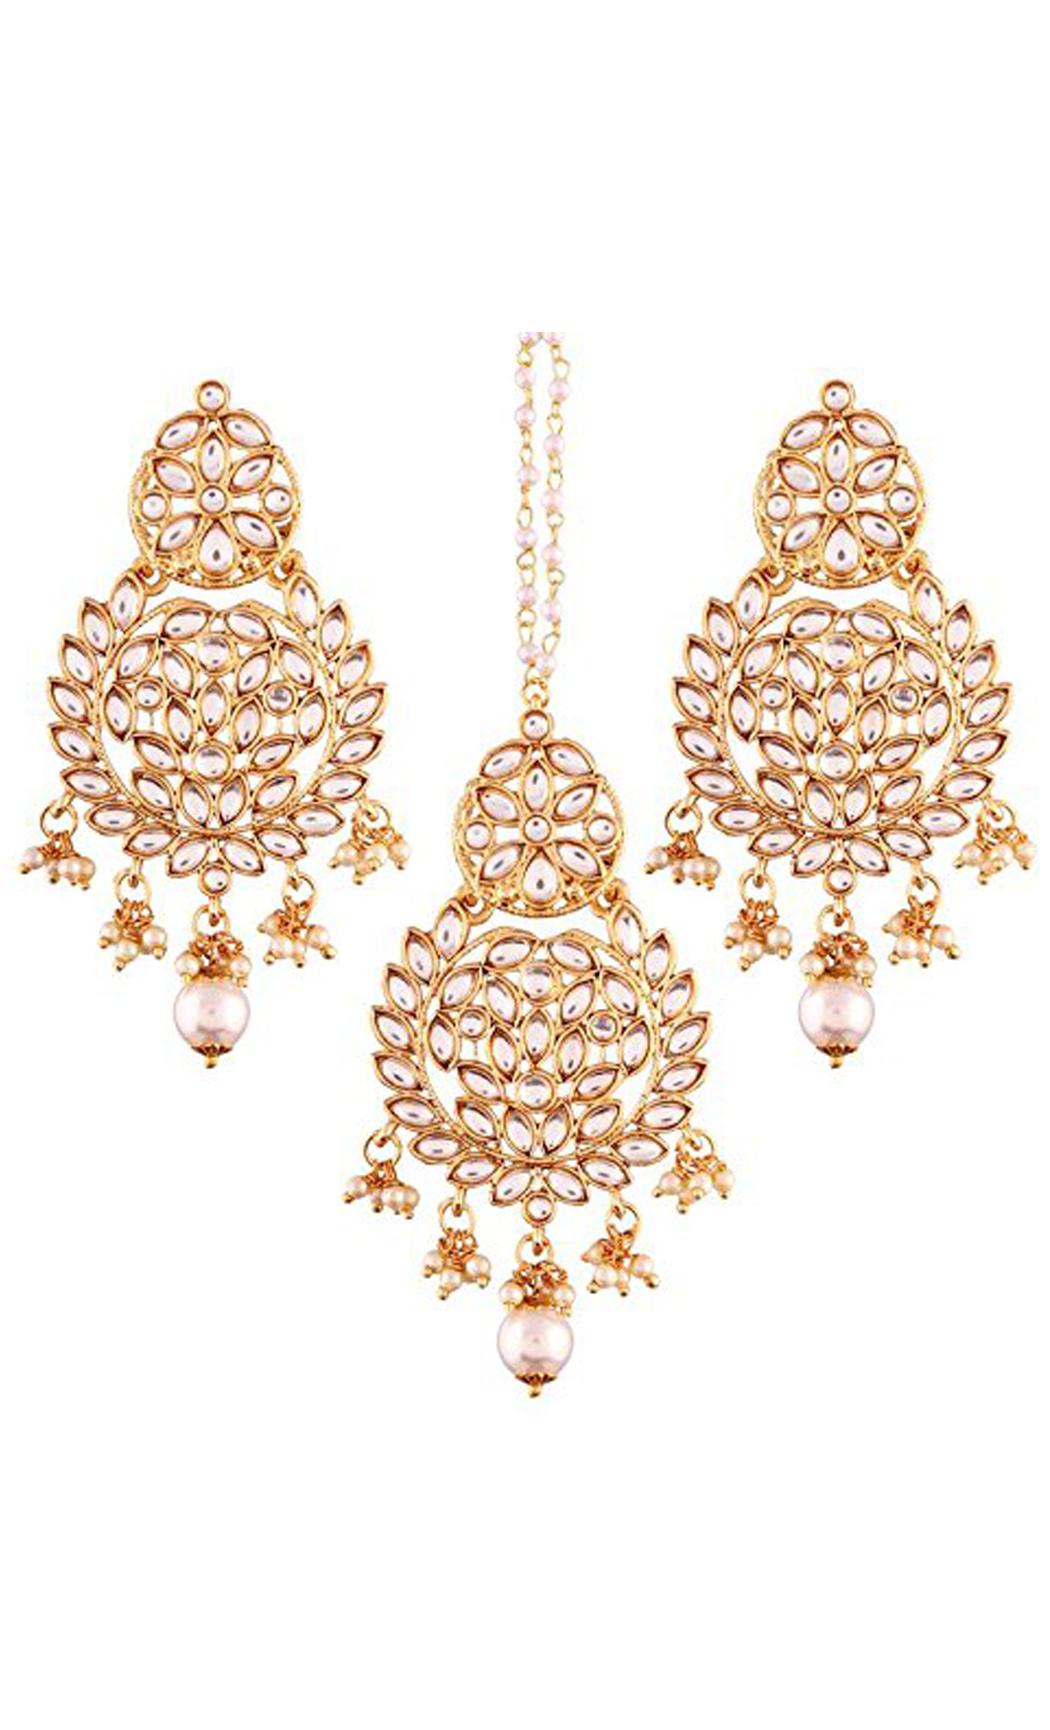 Pearl Chaandbali Wedding Earrings and Maang Tikka Gold Plated | Indian Bridal Jewellery Collection